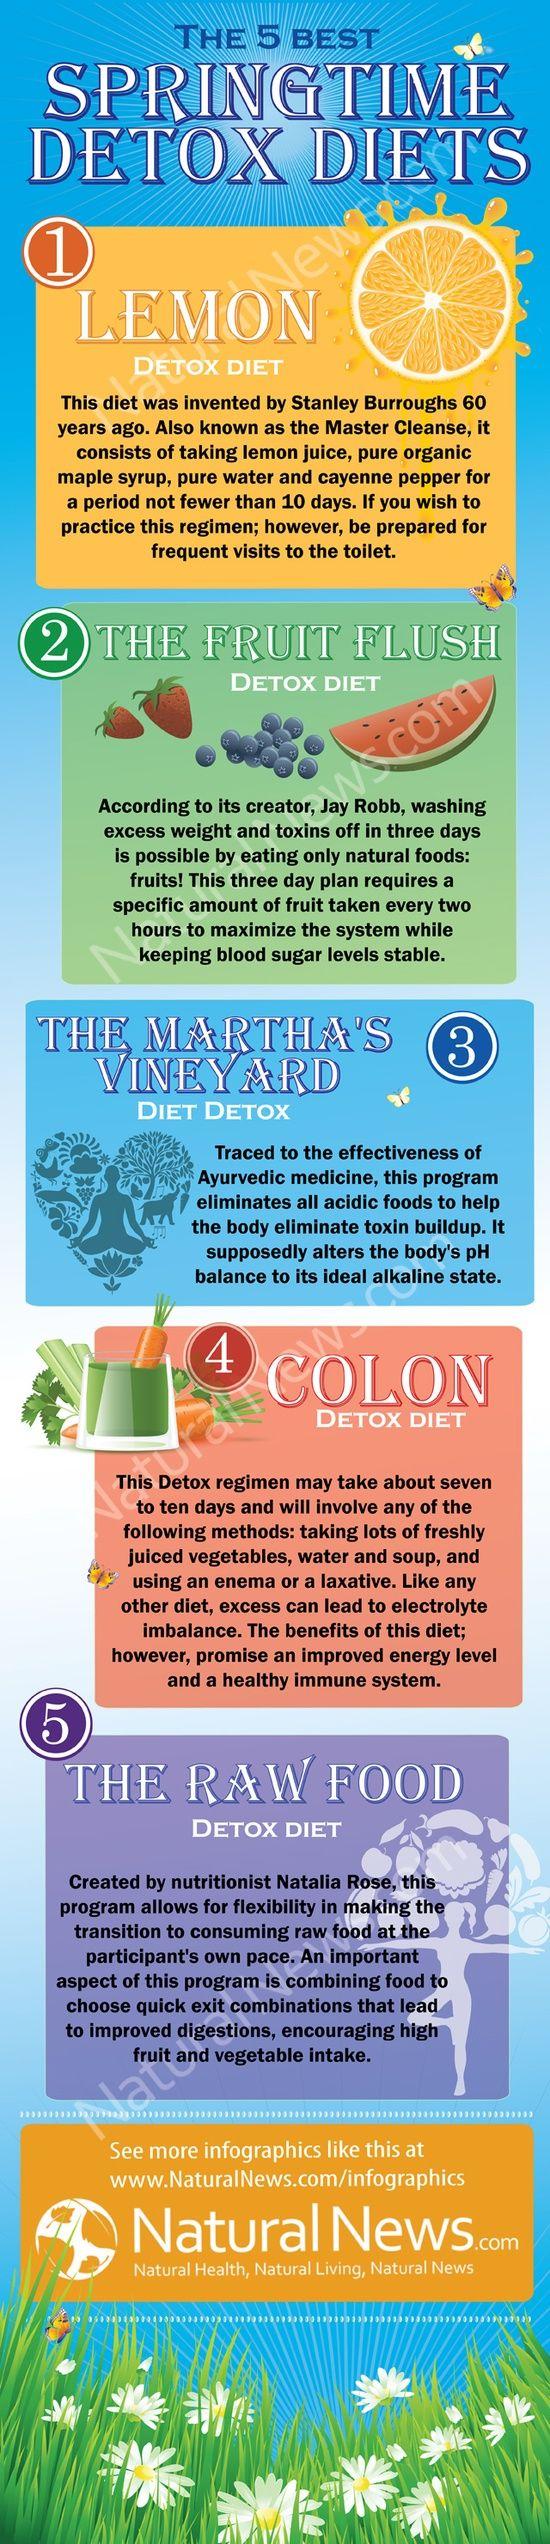 The 5 Best Detox Diets...